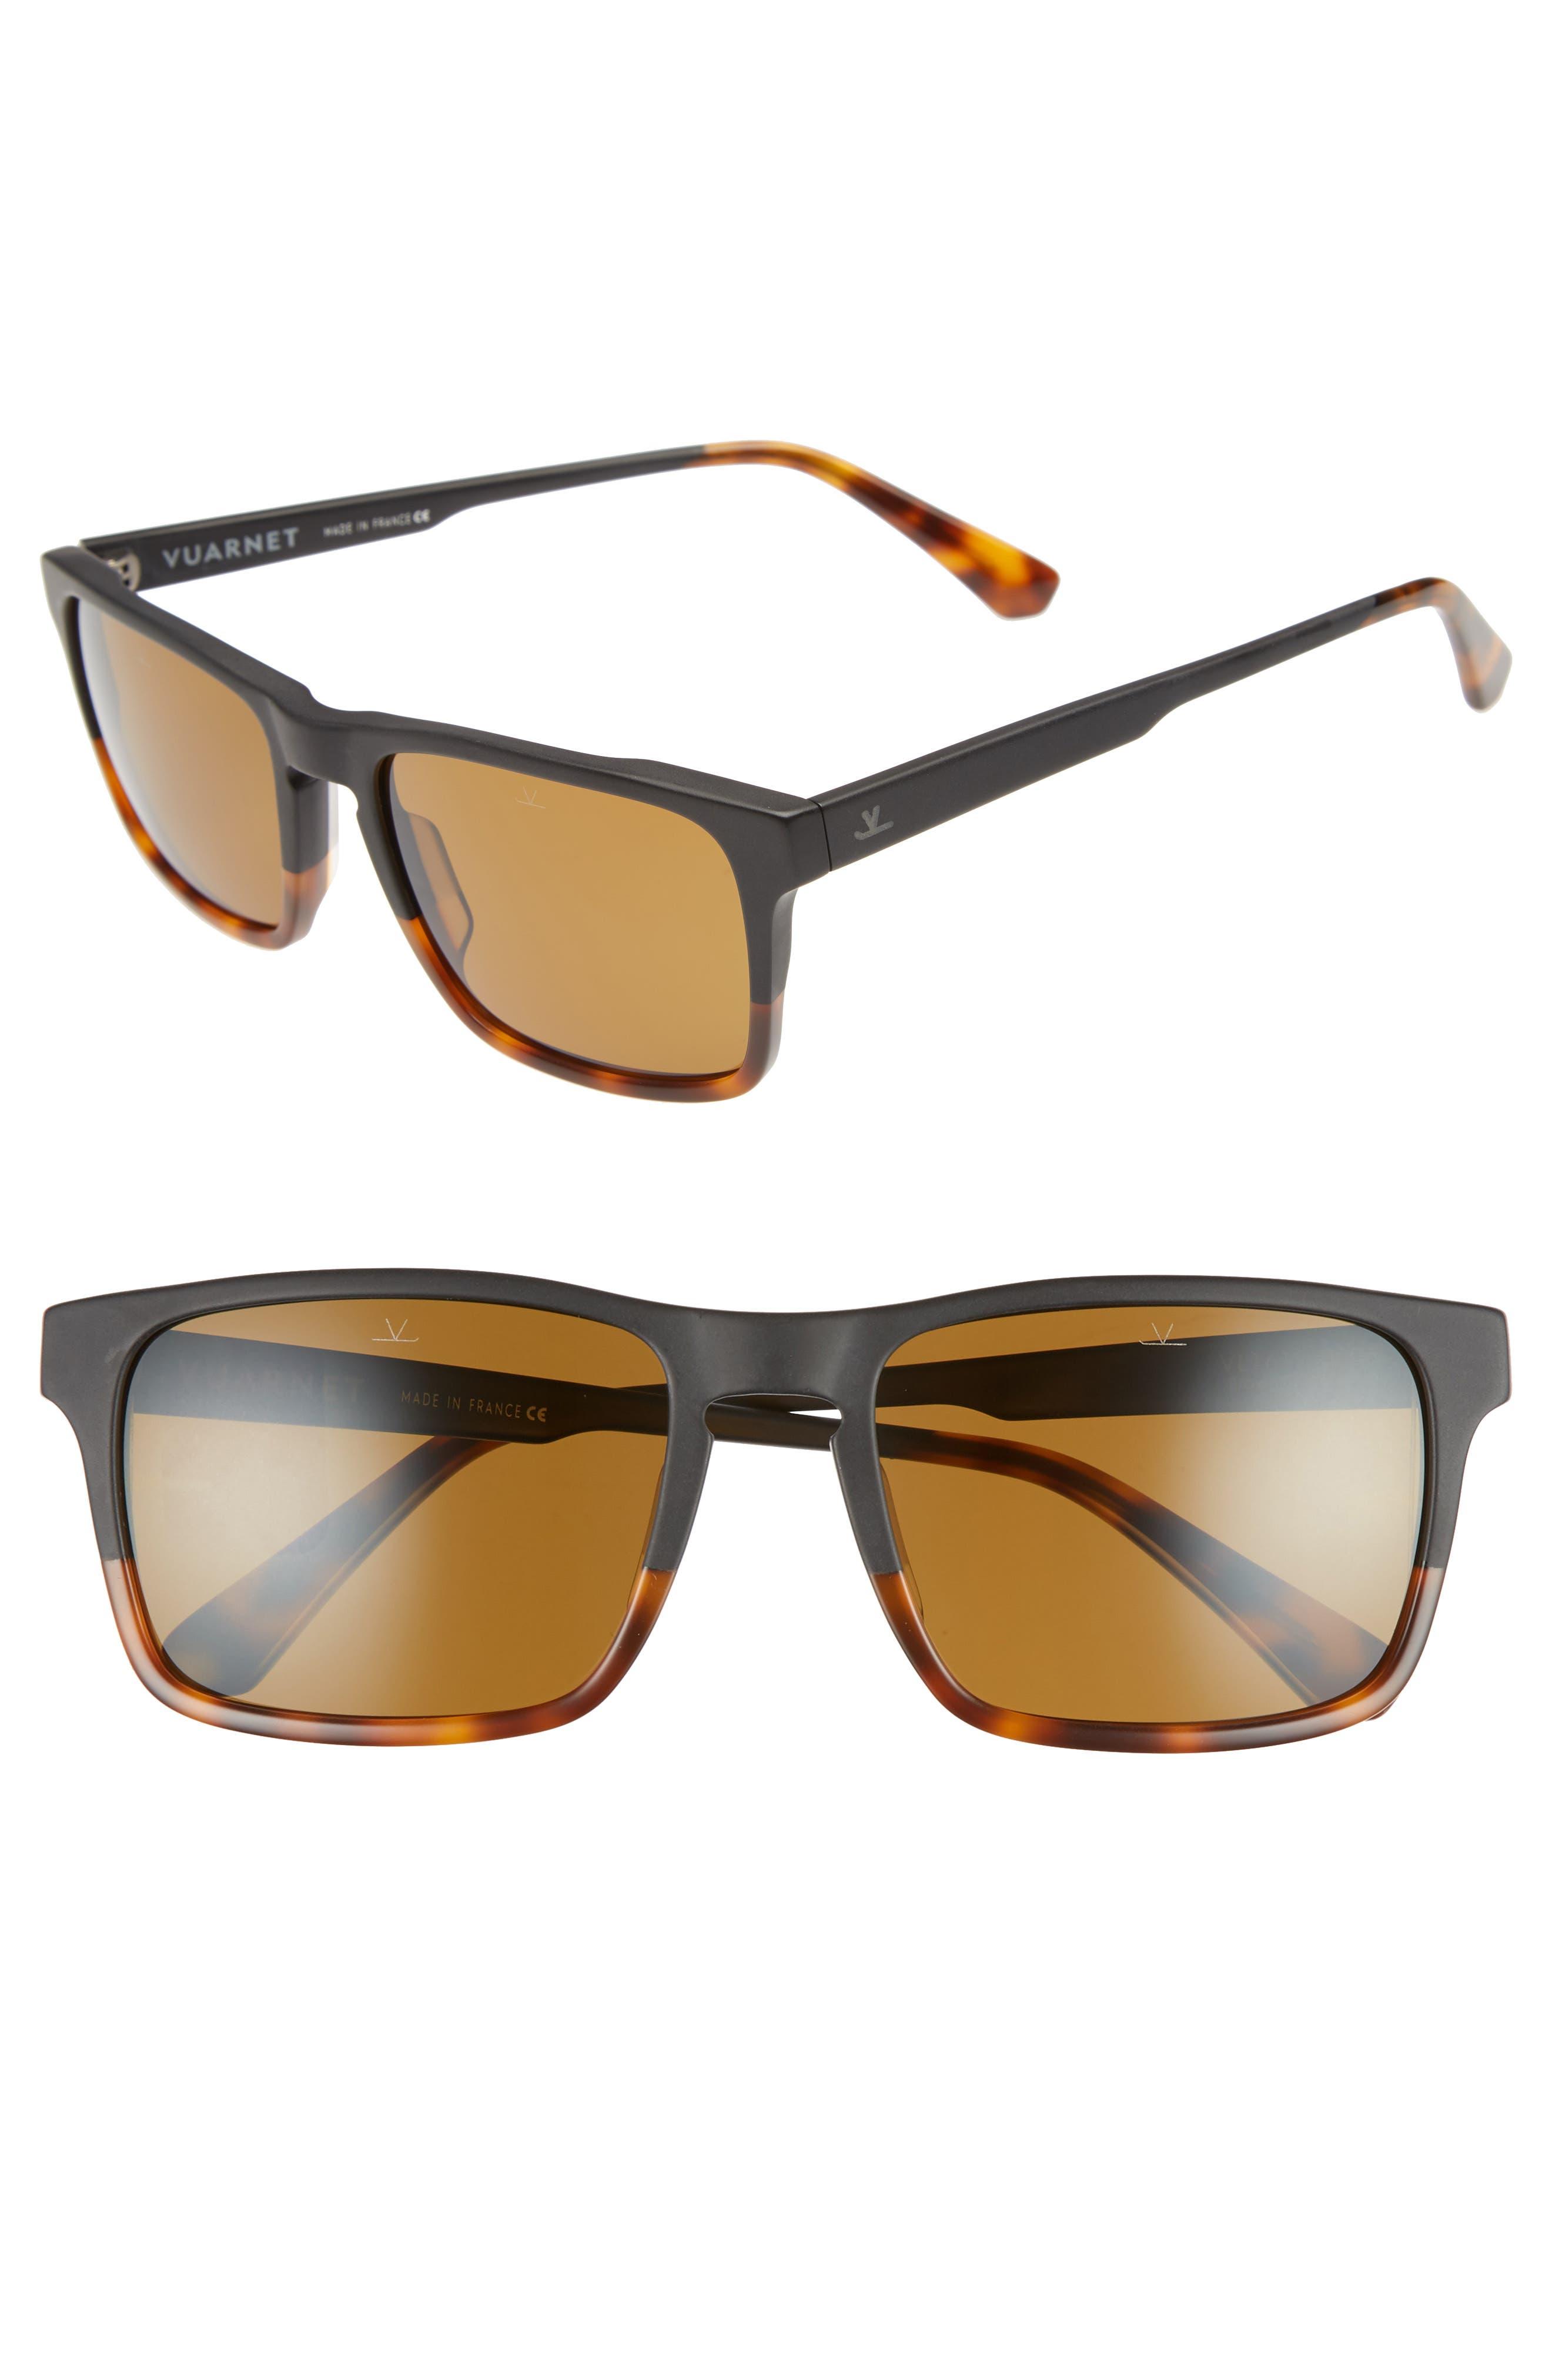 Large District 54mm Sunglasses,                             Main thumbnail 1, color,                             Matt Black / Tortoise